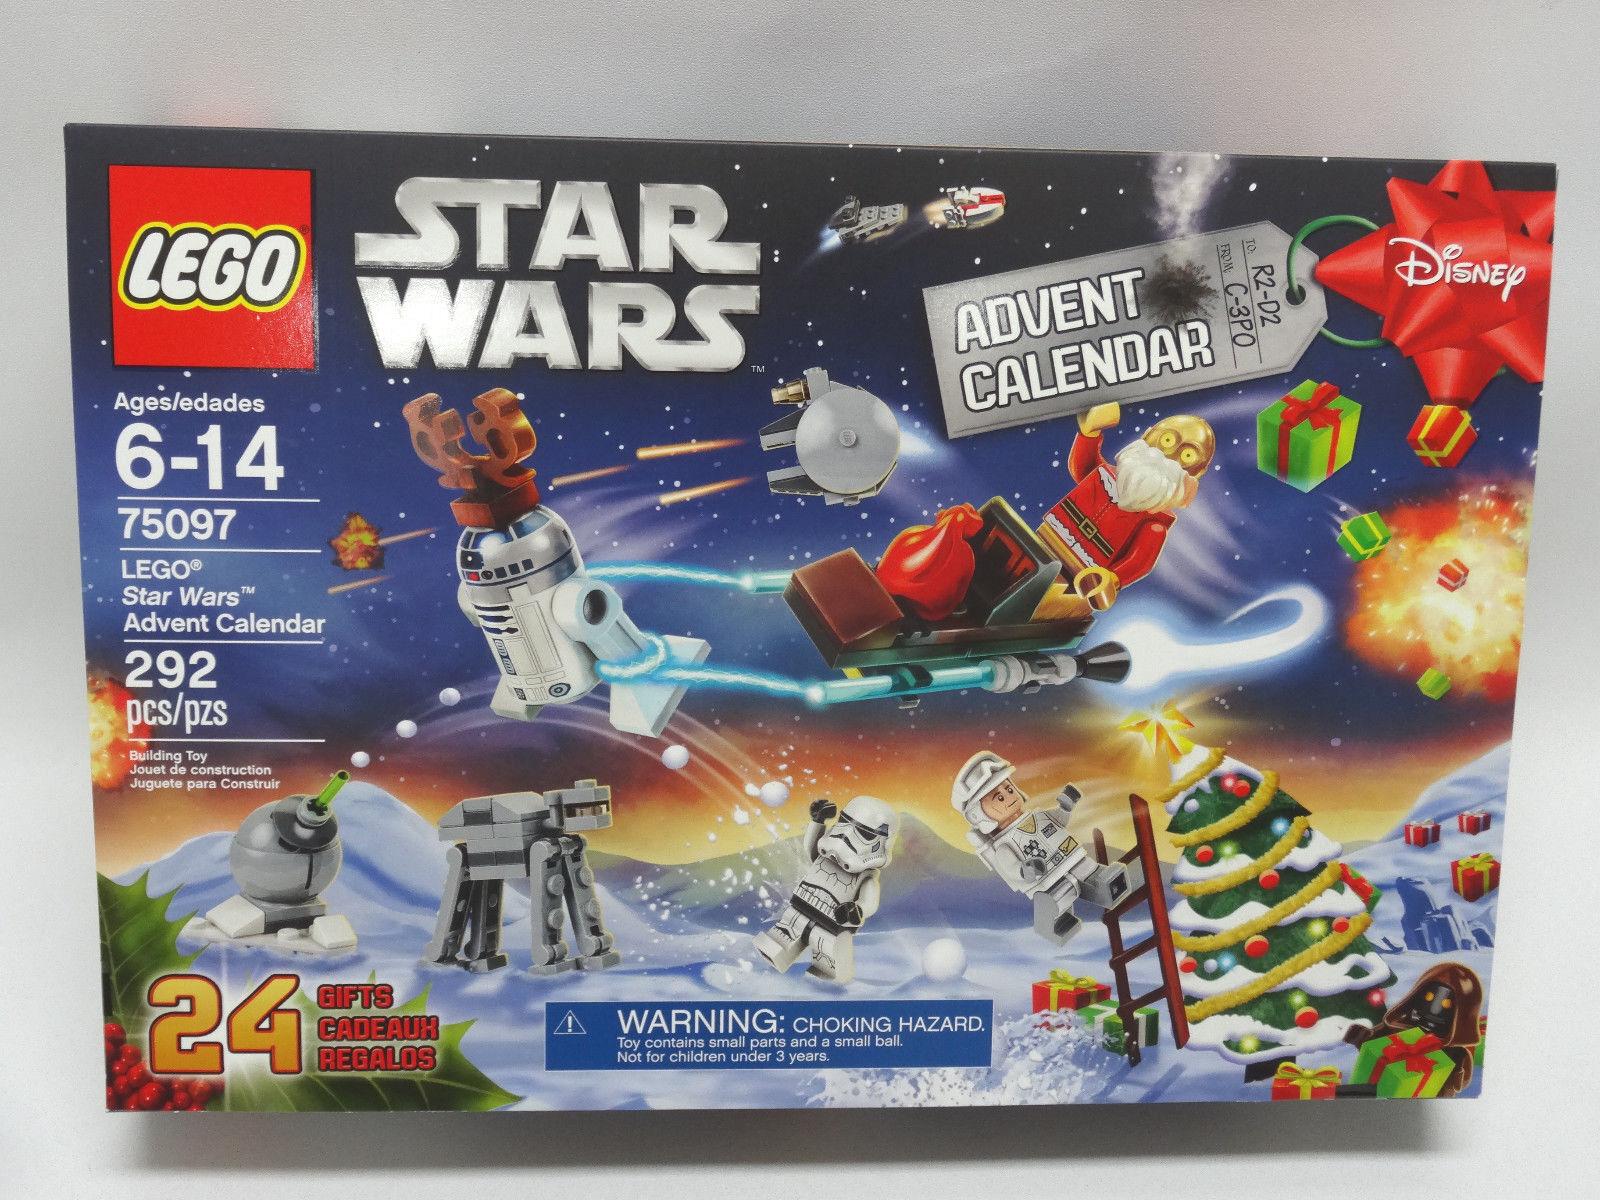 LEGO STAR WARS ADVENT CALENDAR - 2015 - NEW IN BOX - LIMITED EDITION